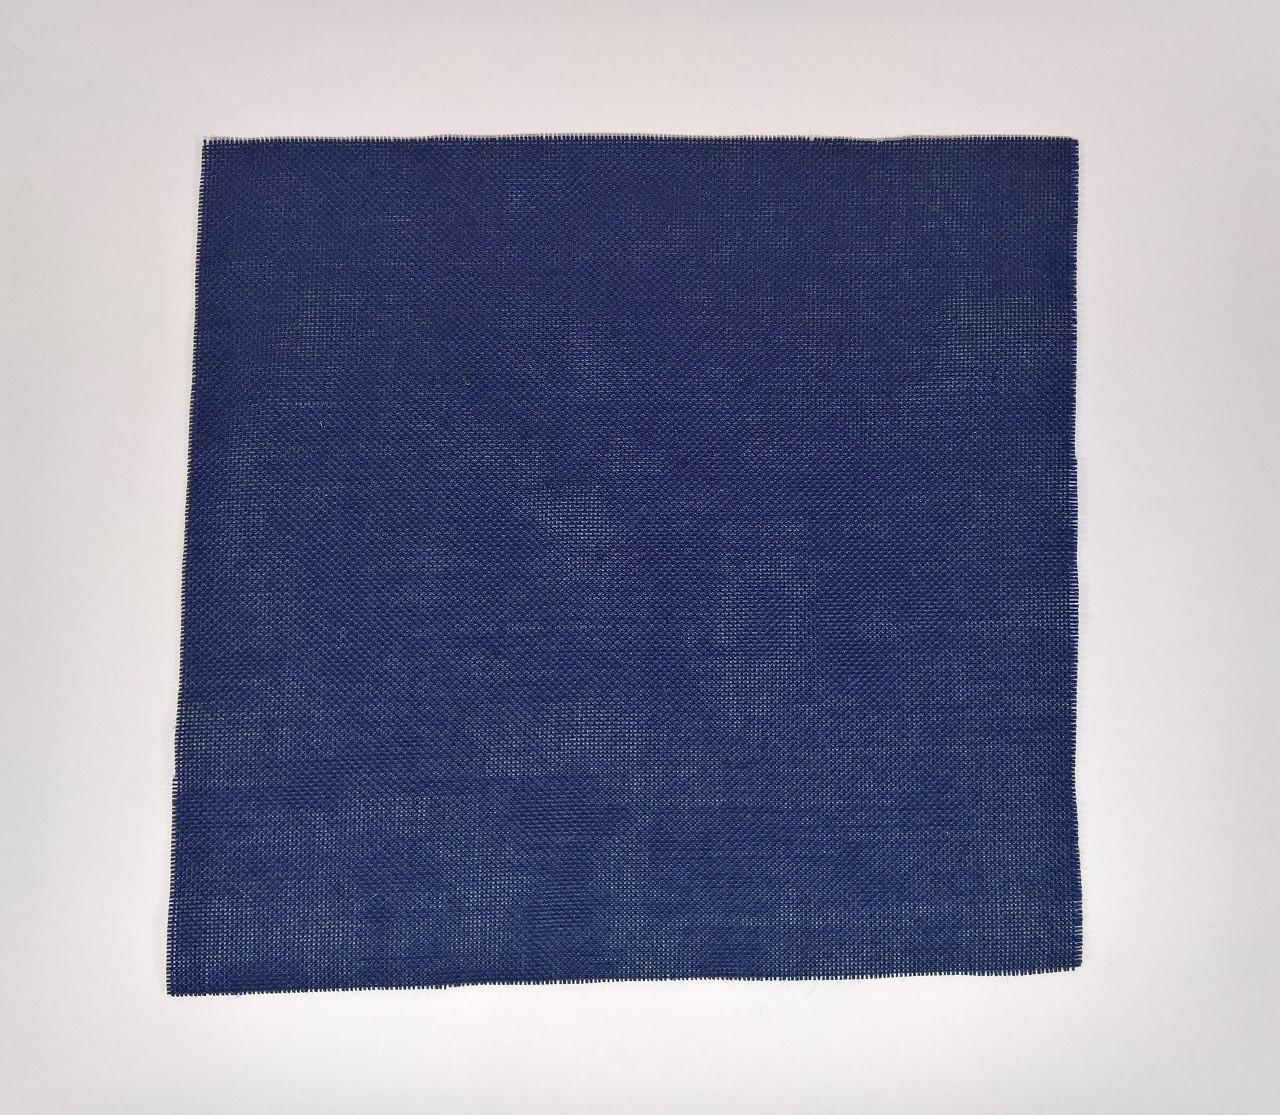 Тканый полиэстер (темно-синий) - 150 г/м2